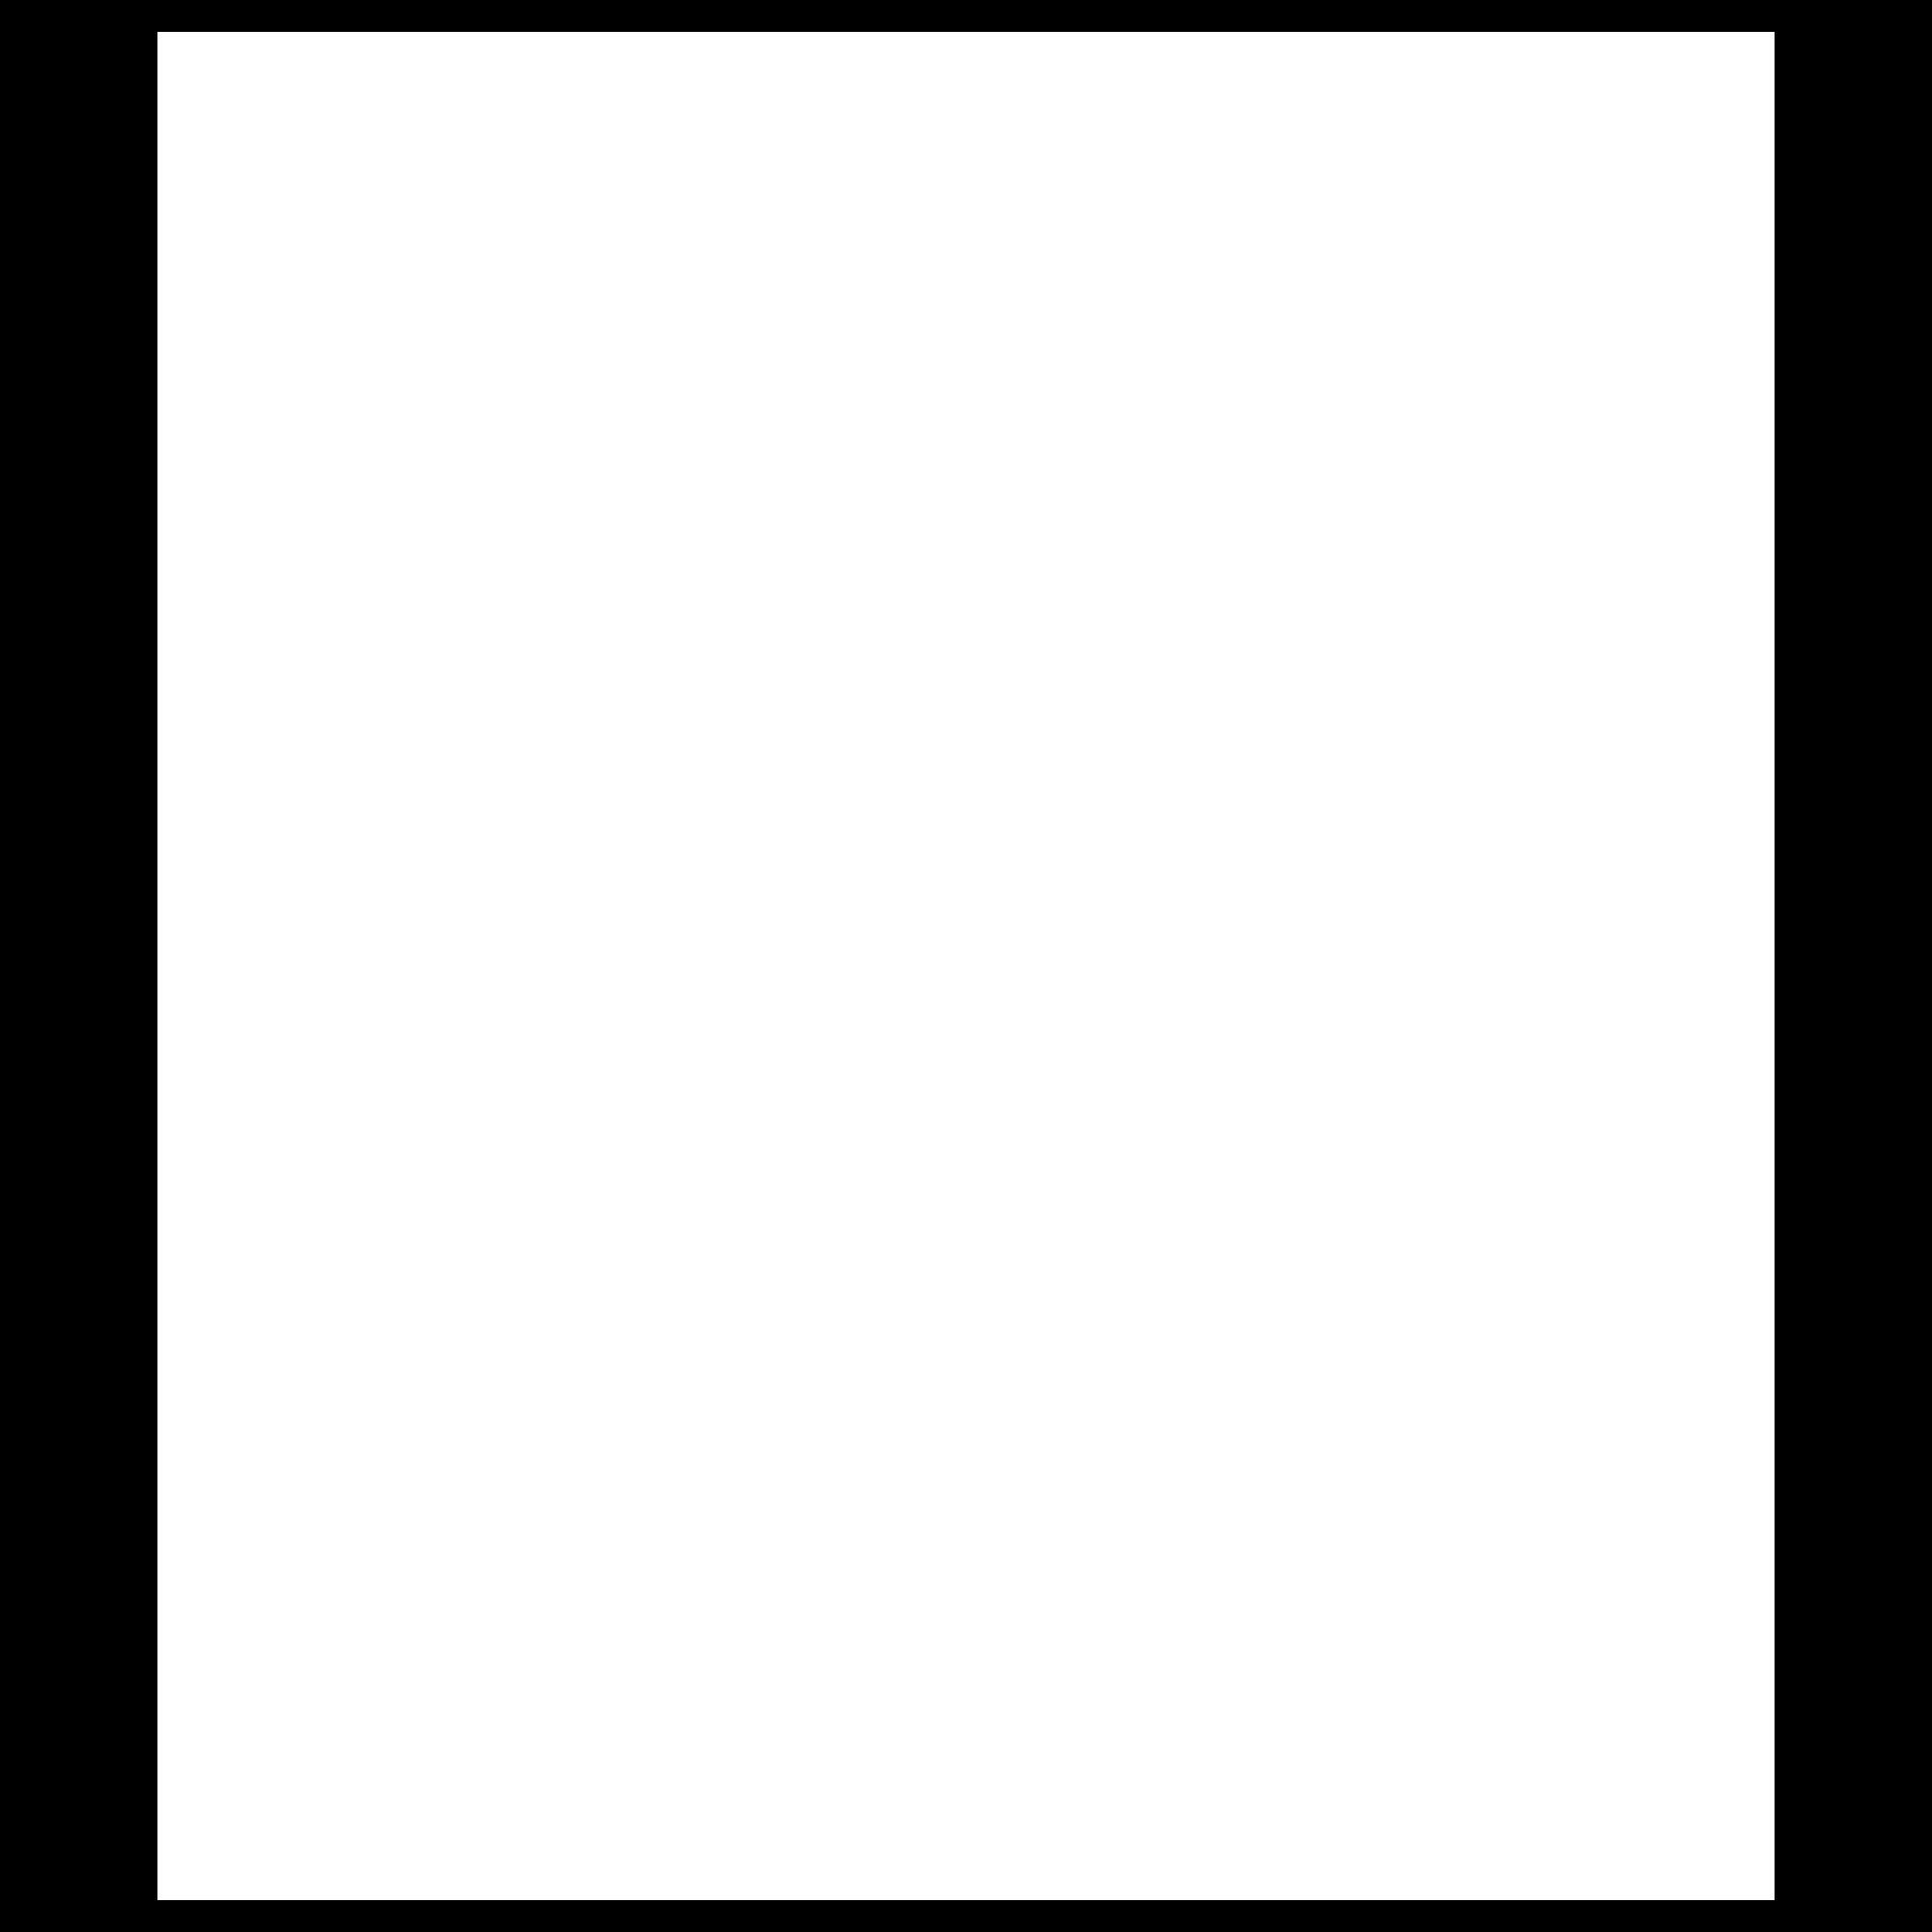 ROG_Convention_2019__Mikro_No_ROG_Subline_Uni_White